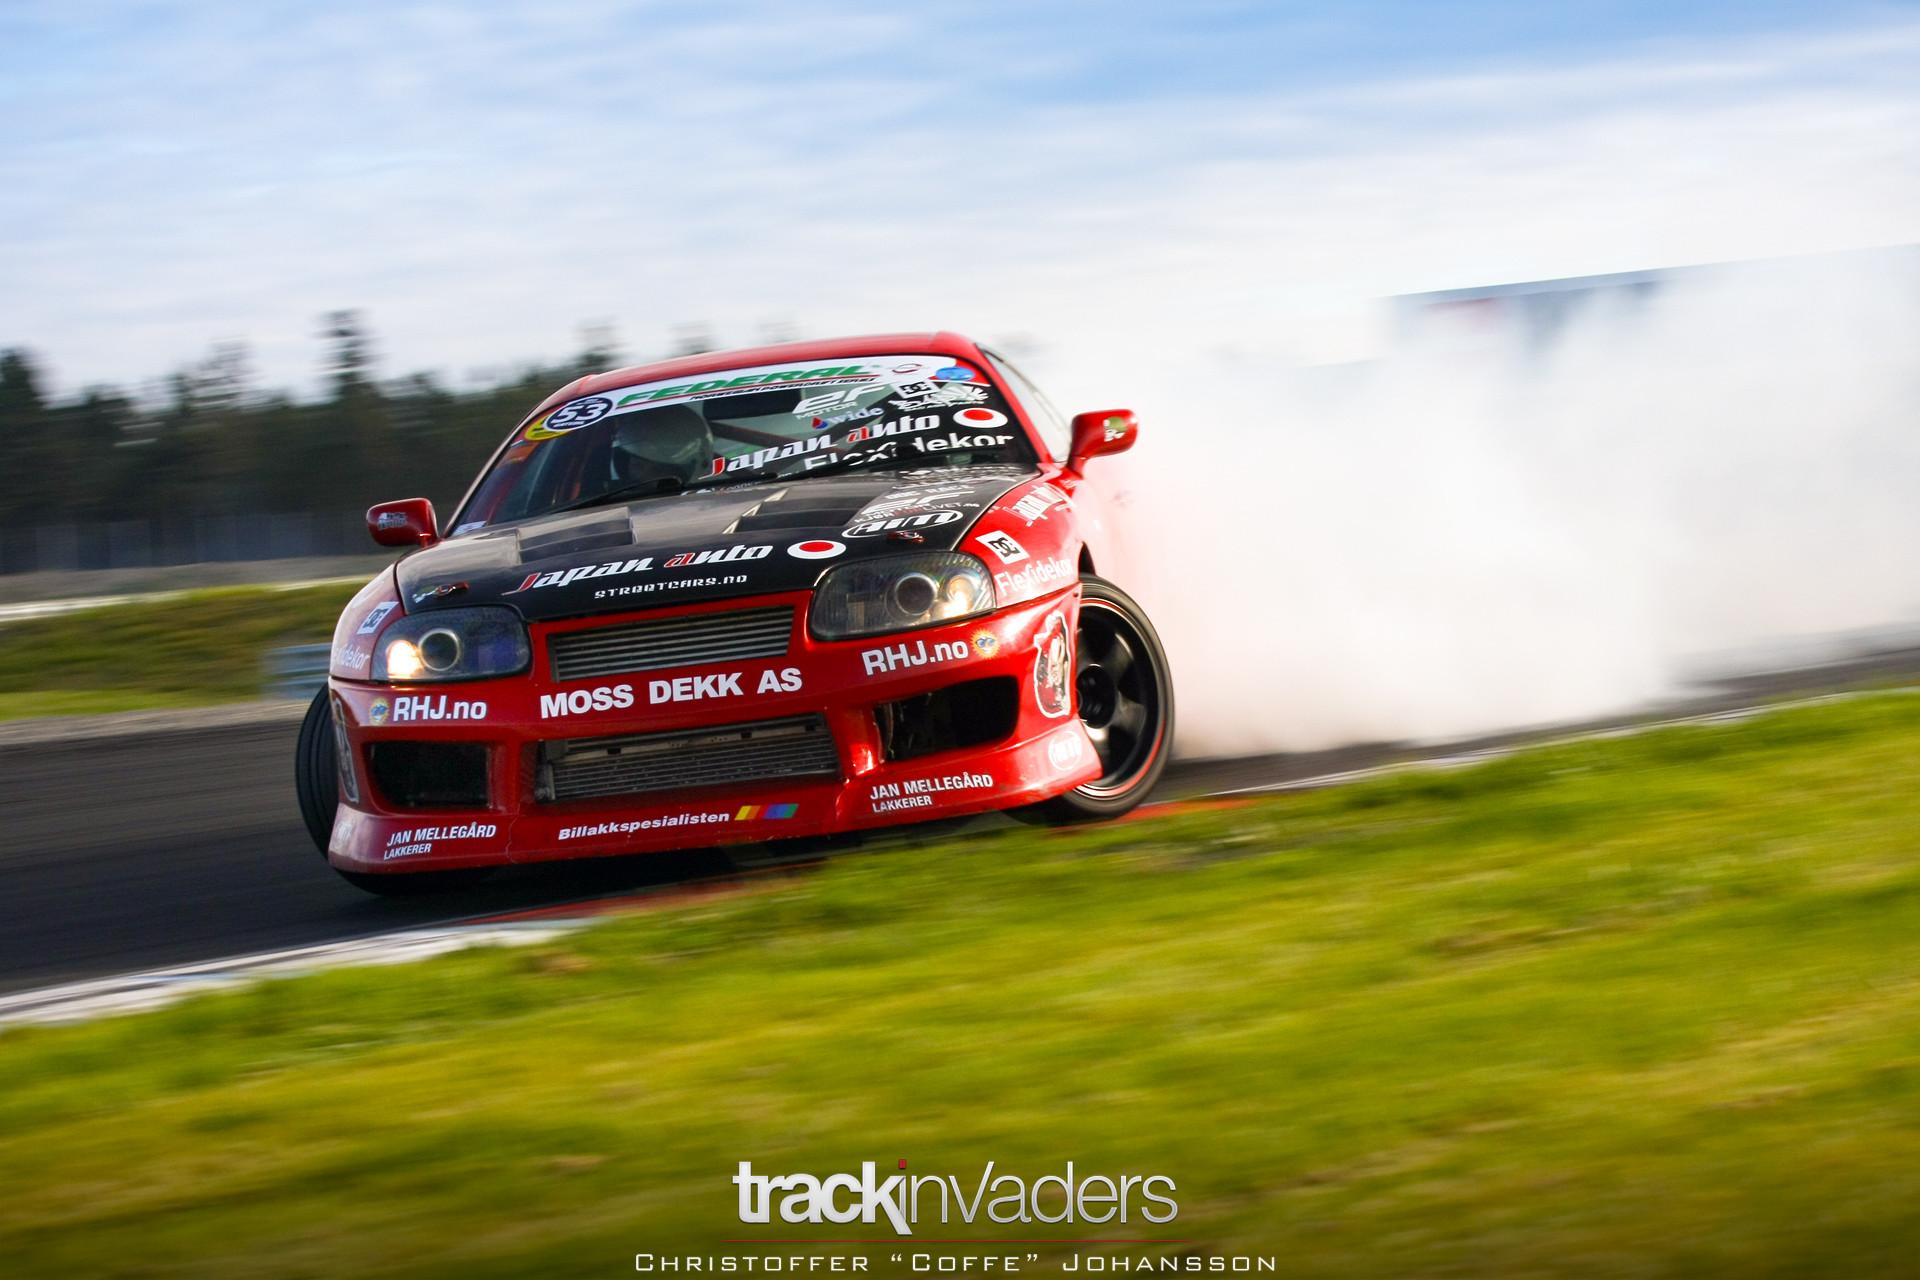 Supra Drift Wallpaper High Definition #54m | Cars | Pinterest | Toyota supra,  Toyota and Cars